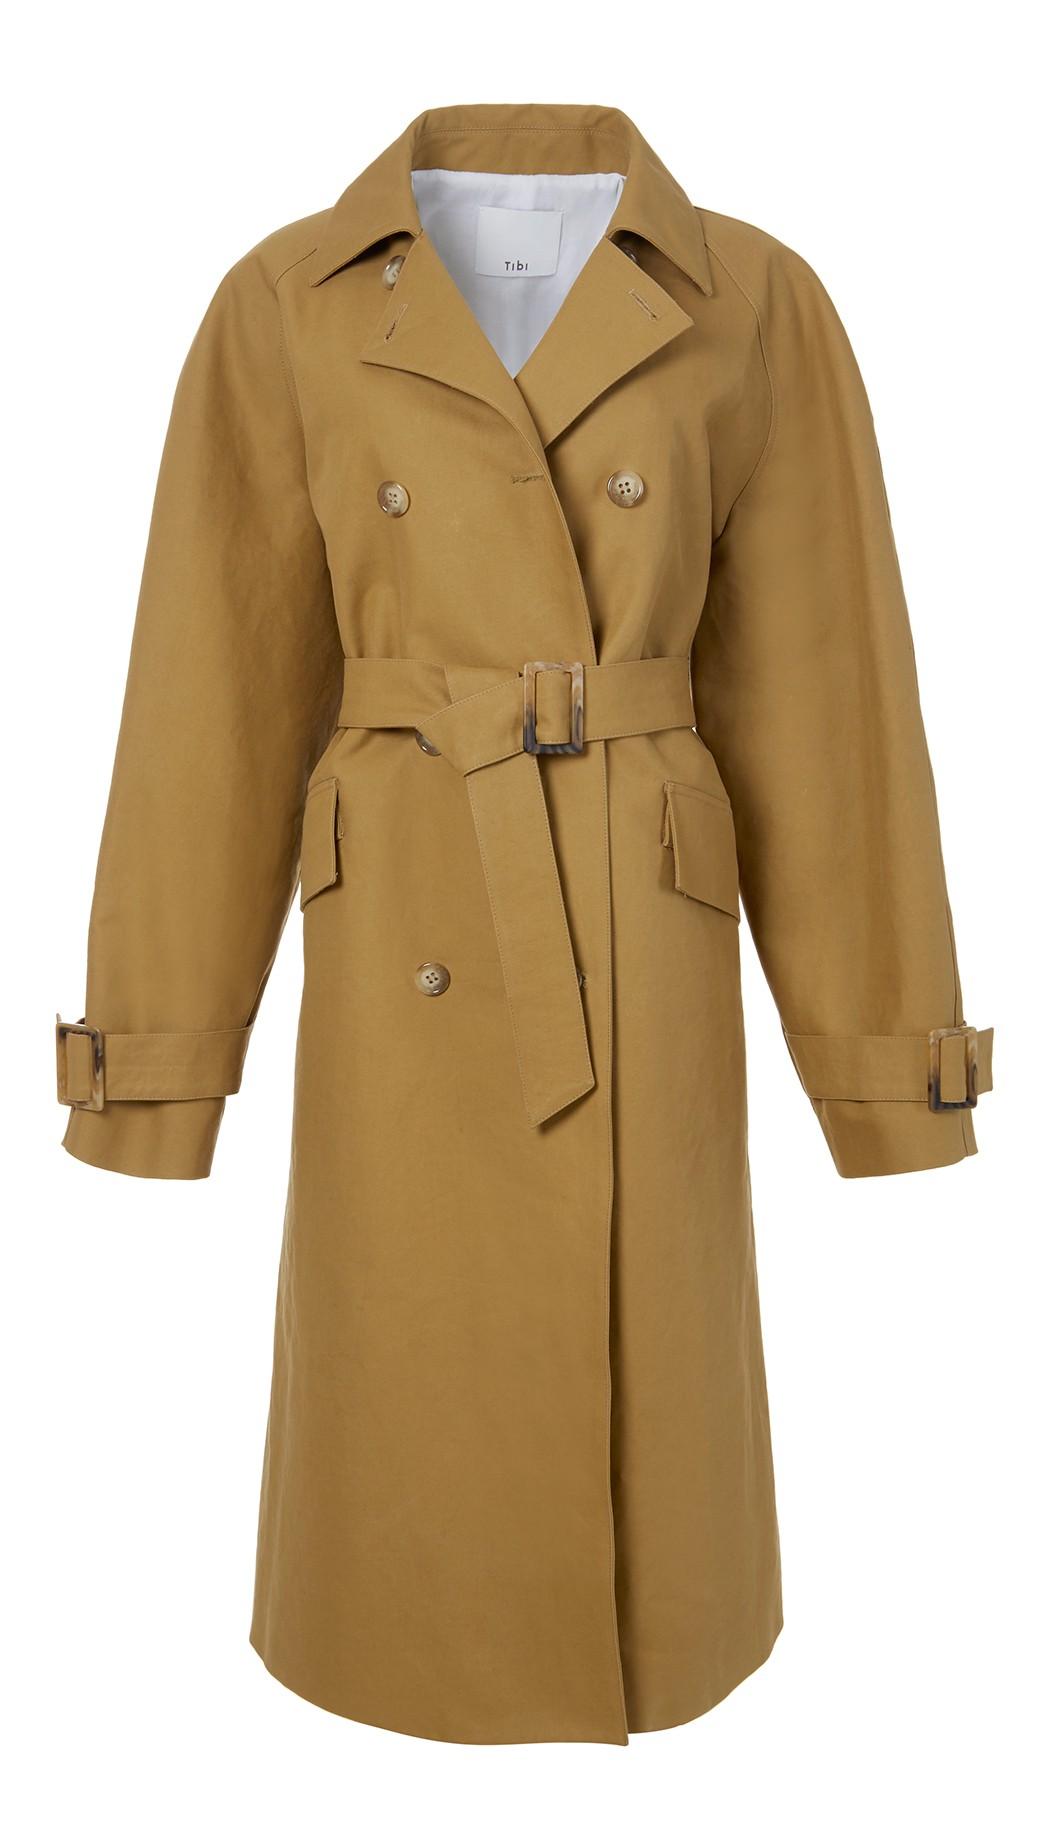 81f9fdf359e Tibi Oversized Cotton-Canvas Trench Coat In Caramel